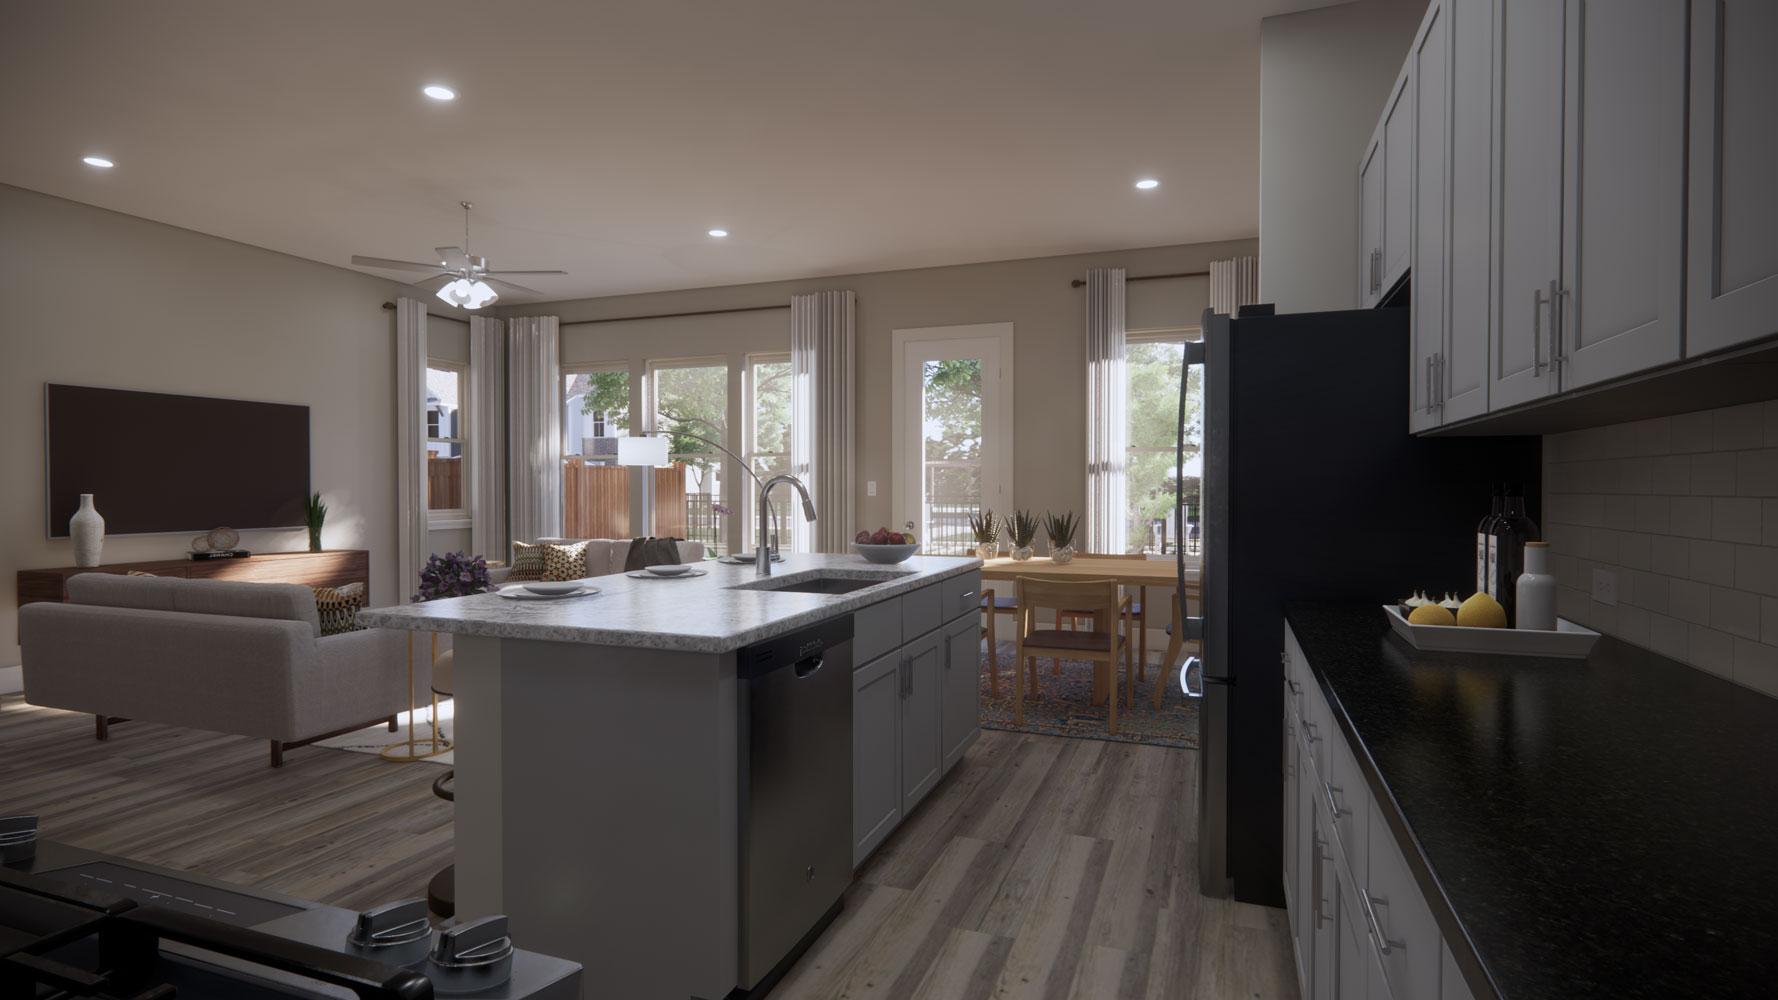 Upgraded Kitchen at Echelon at Reverchon Bluffs in Dallas, Texas